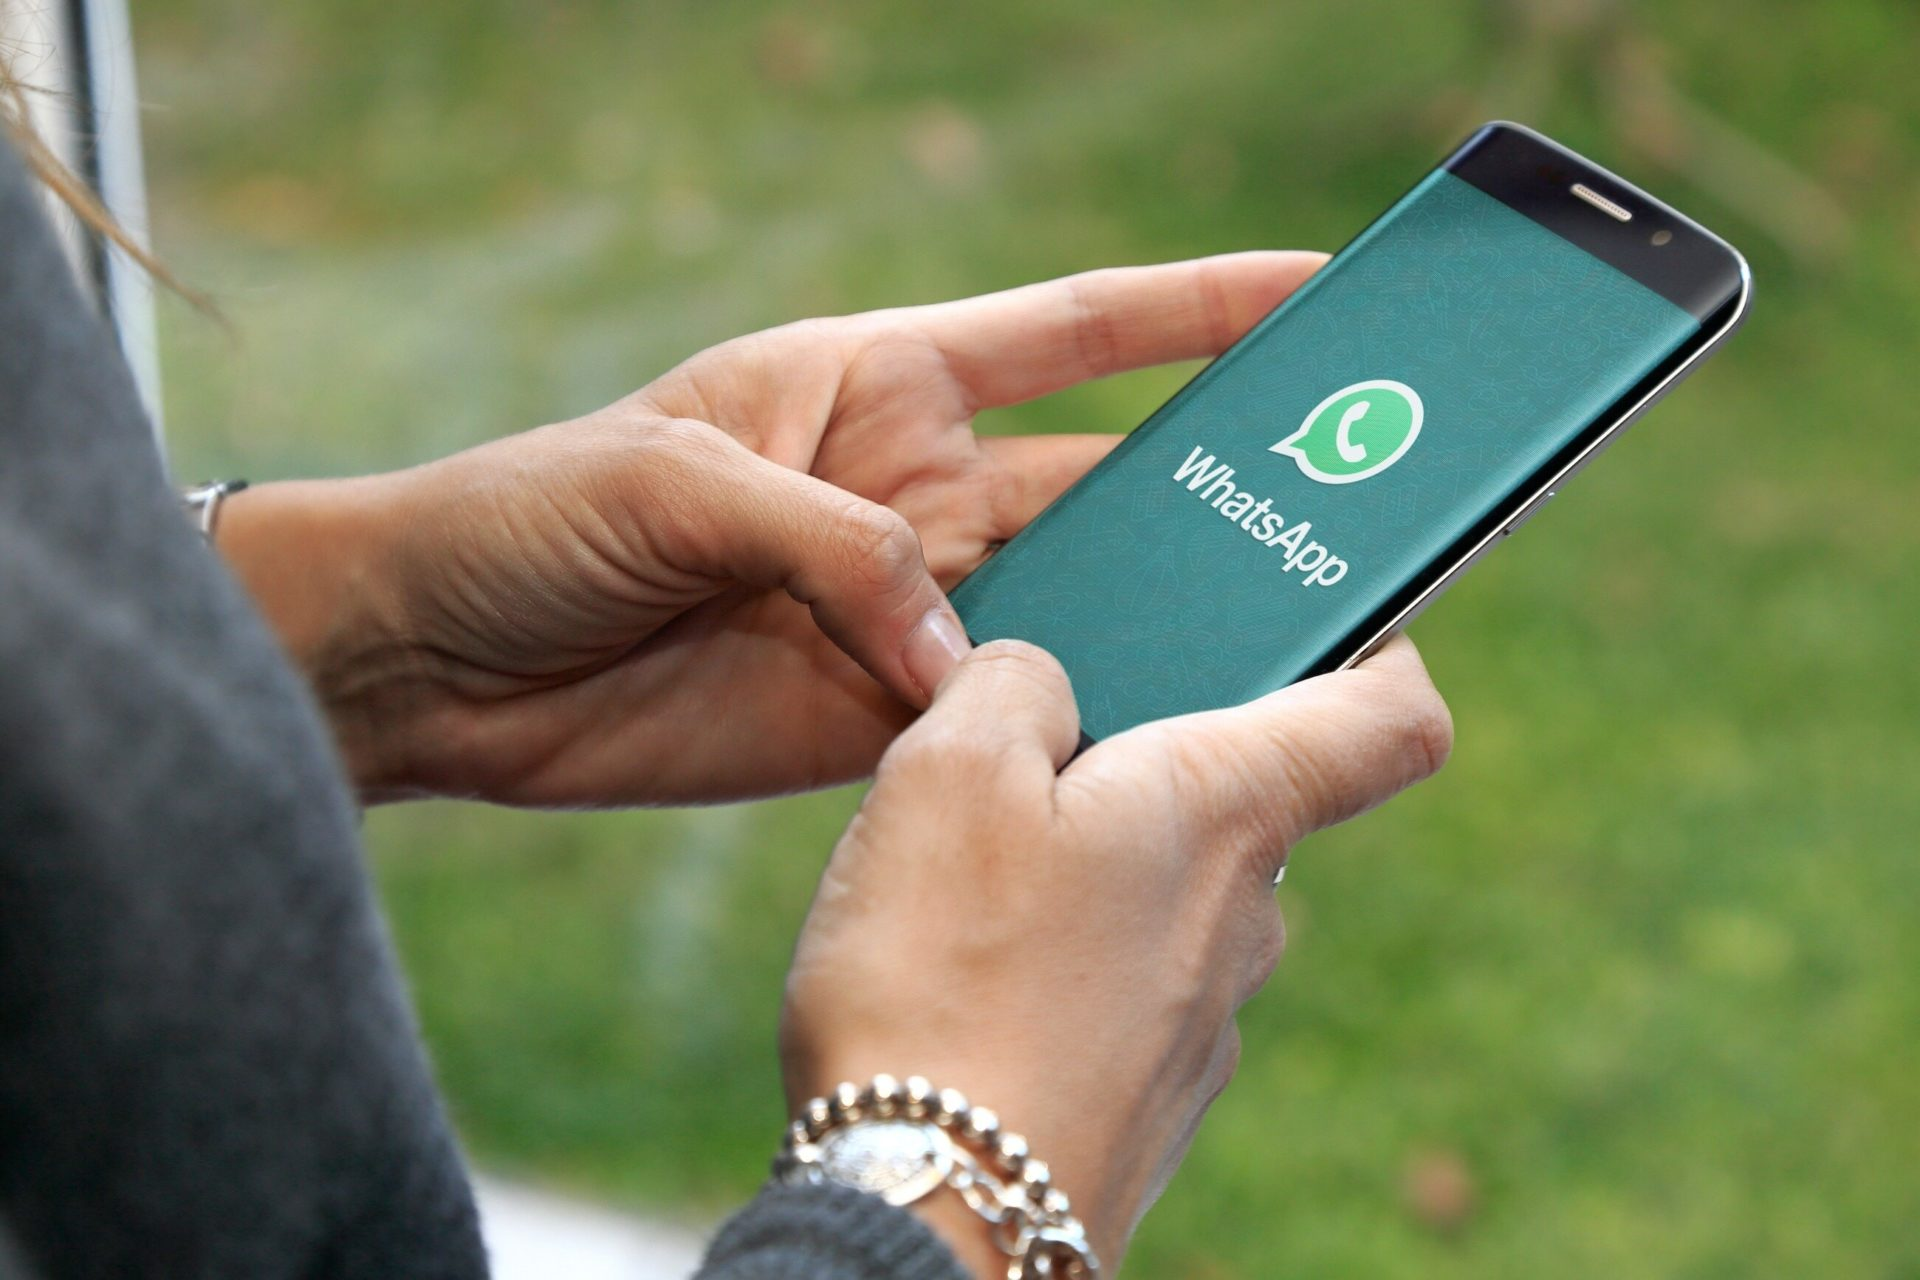 Горелкин: новая политика WhatsApp неэтична